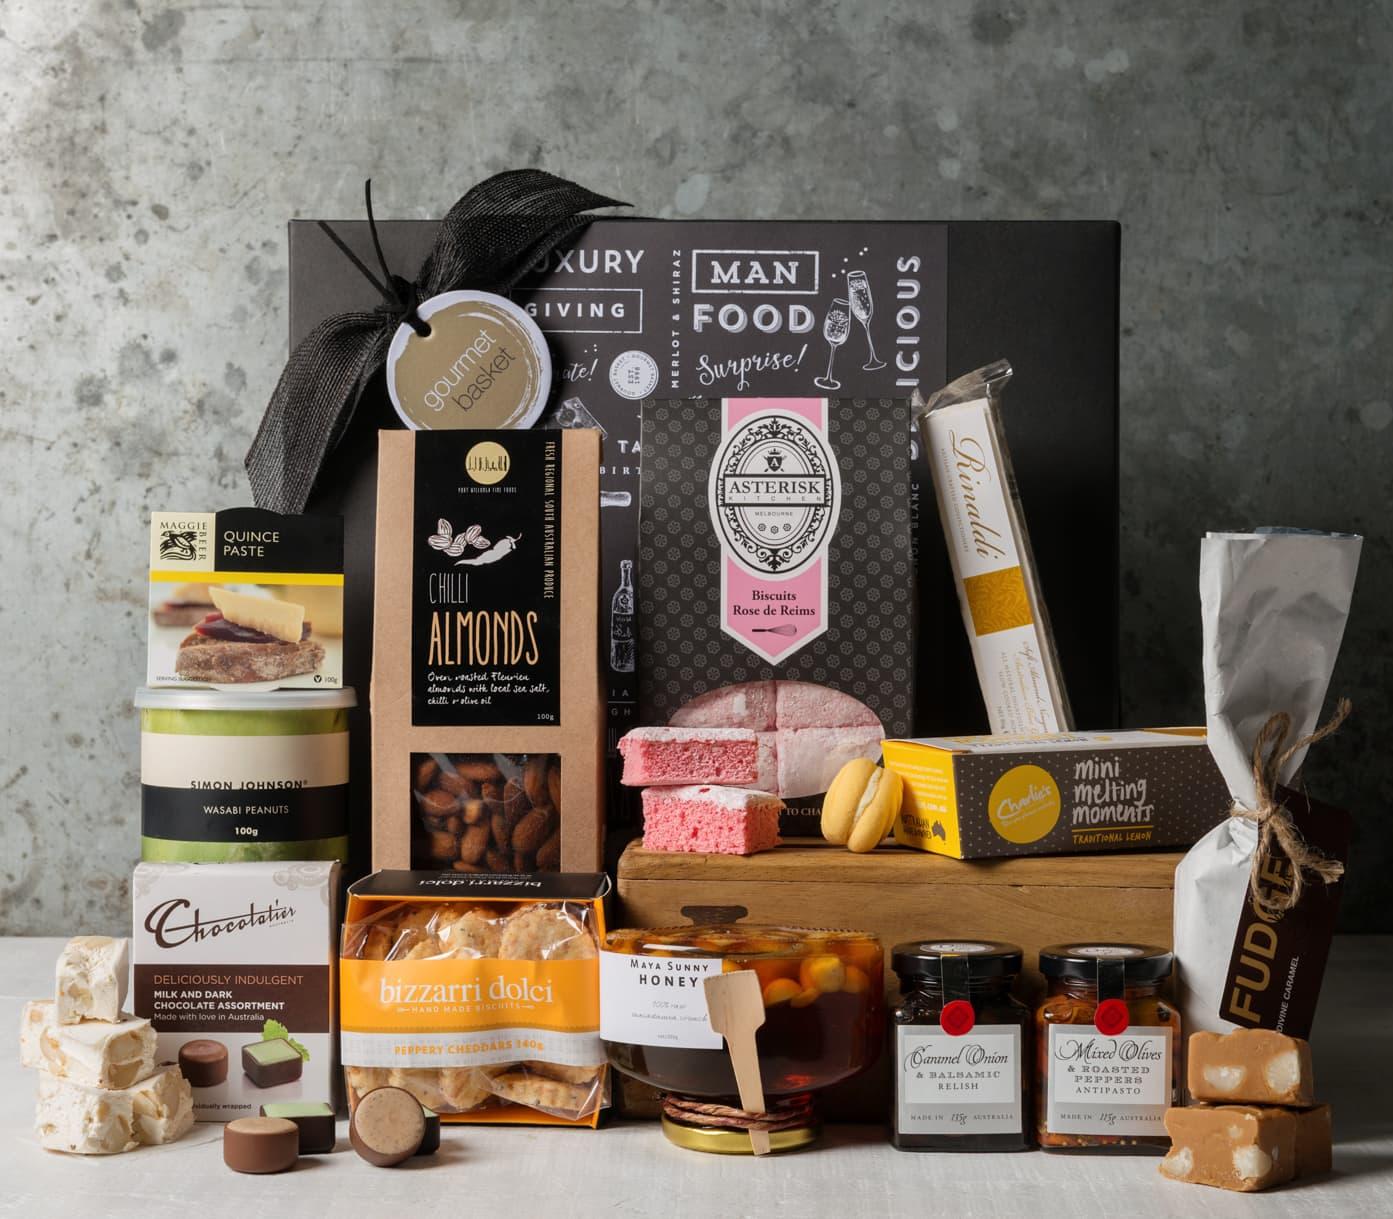 https://www.eatfirst.com/en-AU/suppliers/Gourmet-Basket/Hampers-and-Baskets